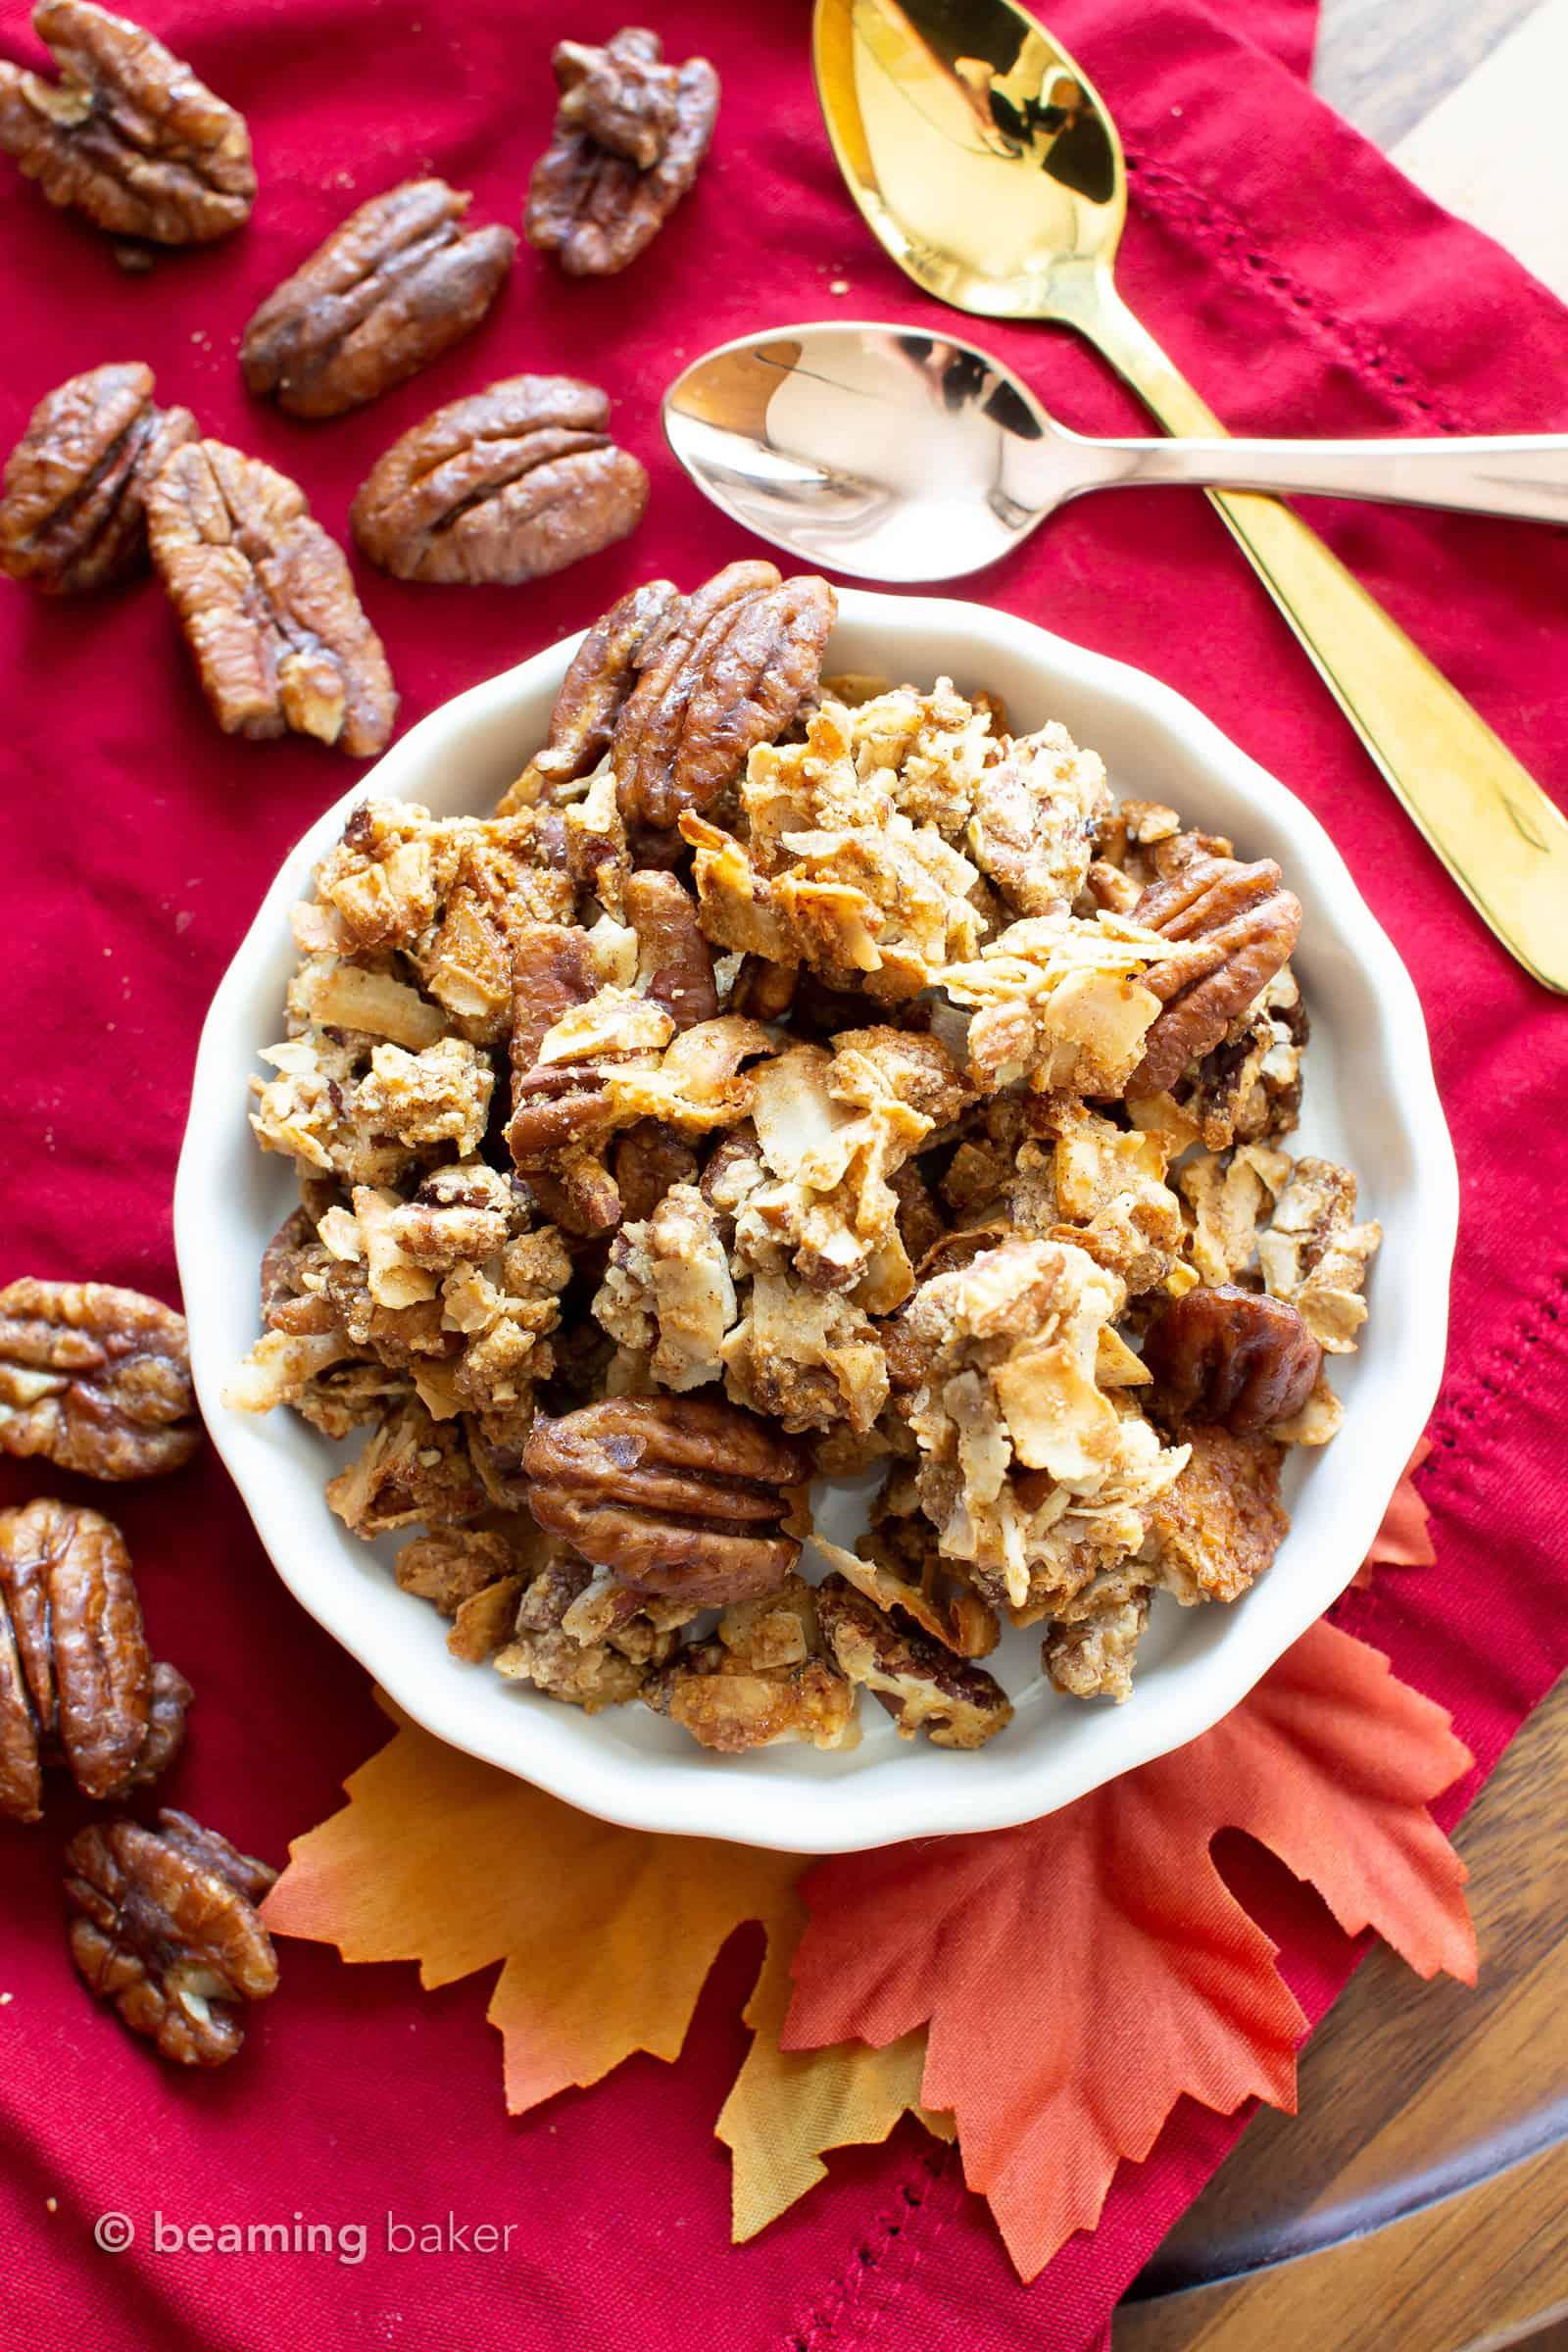 Homemade Maple Pecan Granola (GF, V): the best paleo granola recipe for fall! Crispy, crunchy clusters & maple granola pecan pie flavors—Vegan, Gluten-Free, Healthy! #Paleo #Granola #Vegan #GlutenFree | Recipe at BeamingBaker.com